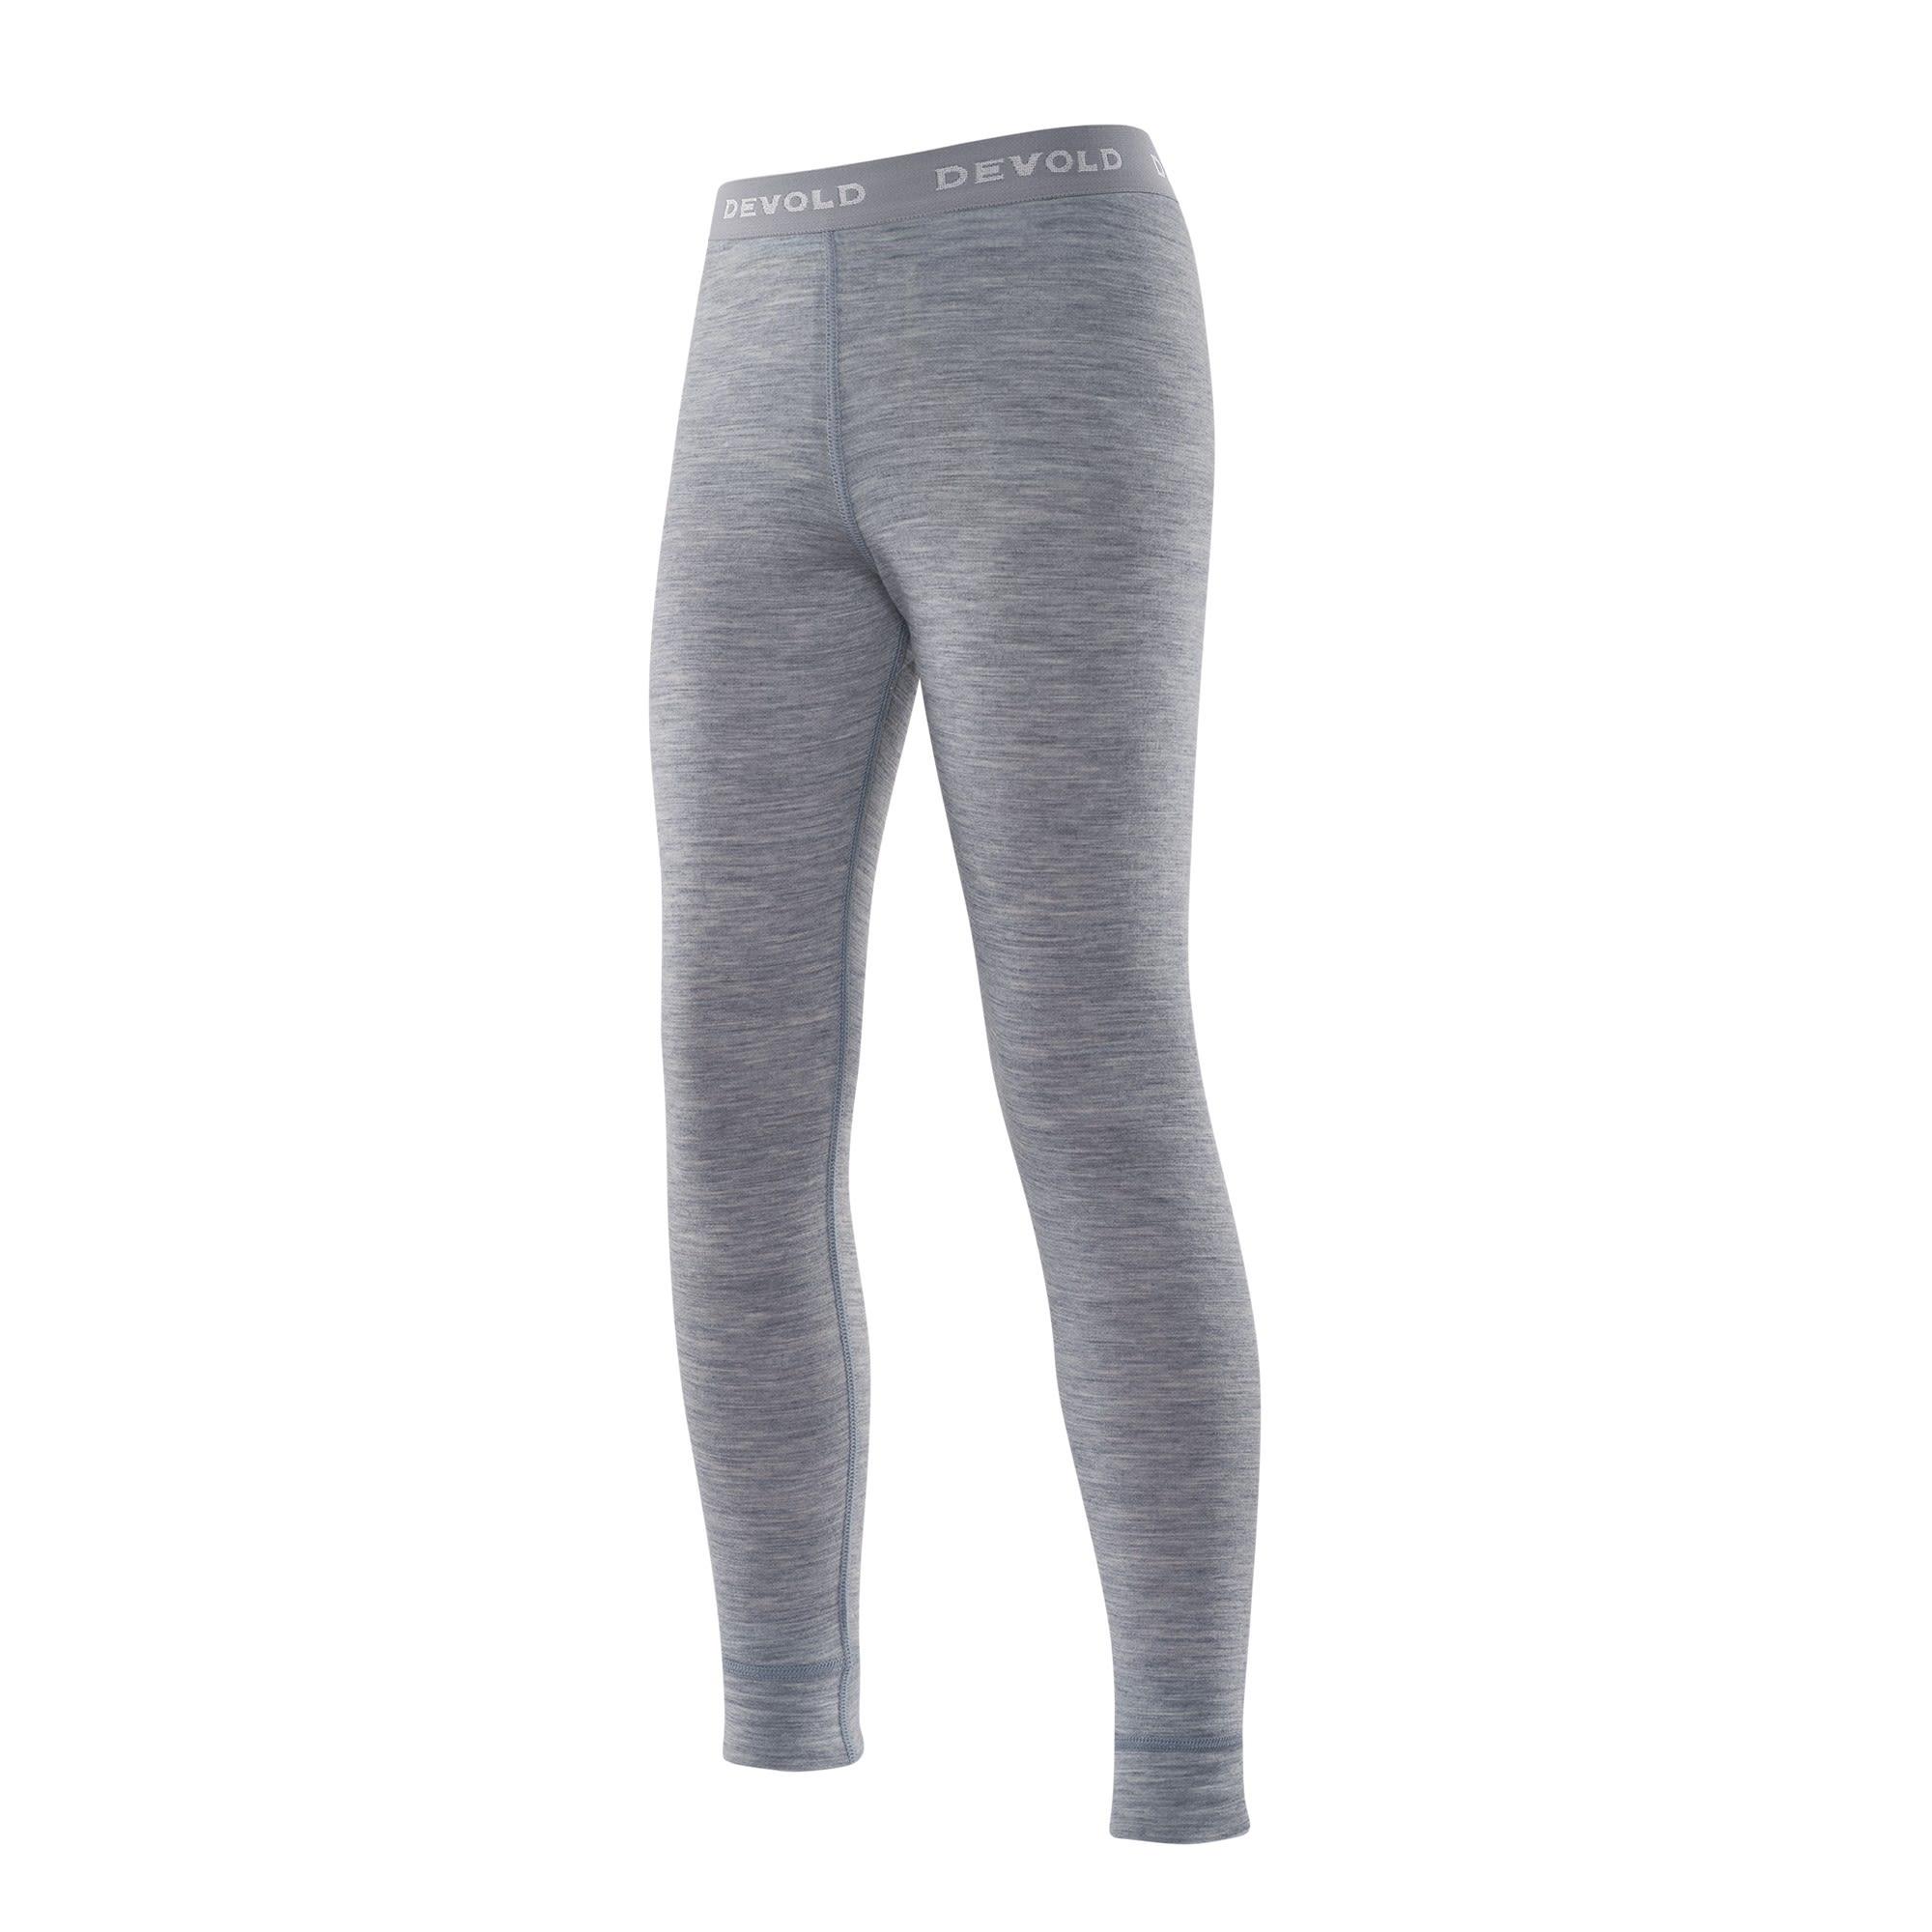 Devold Breeze Junior Long Johns Grau, Merino 12 -Farbe Grey Melange, 12